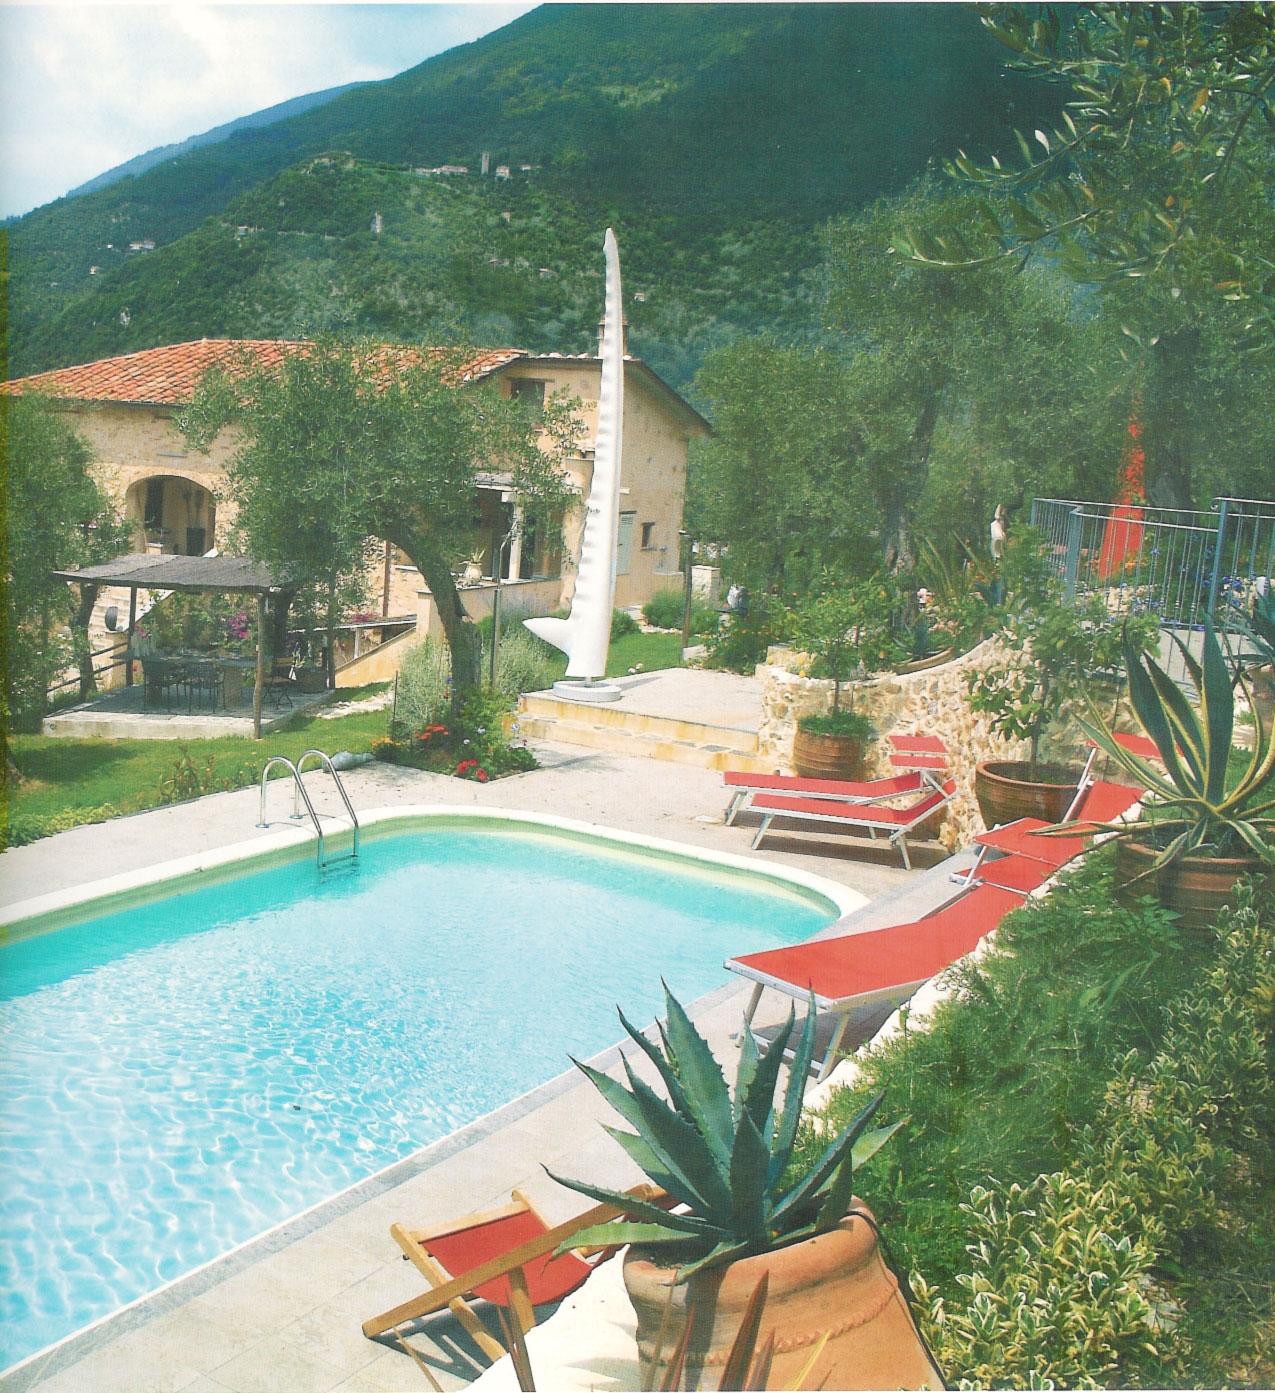 Casa del Sole - Camaiore (LU) - Italia  - Casa del Sole - Camaiore (LU) - Italia